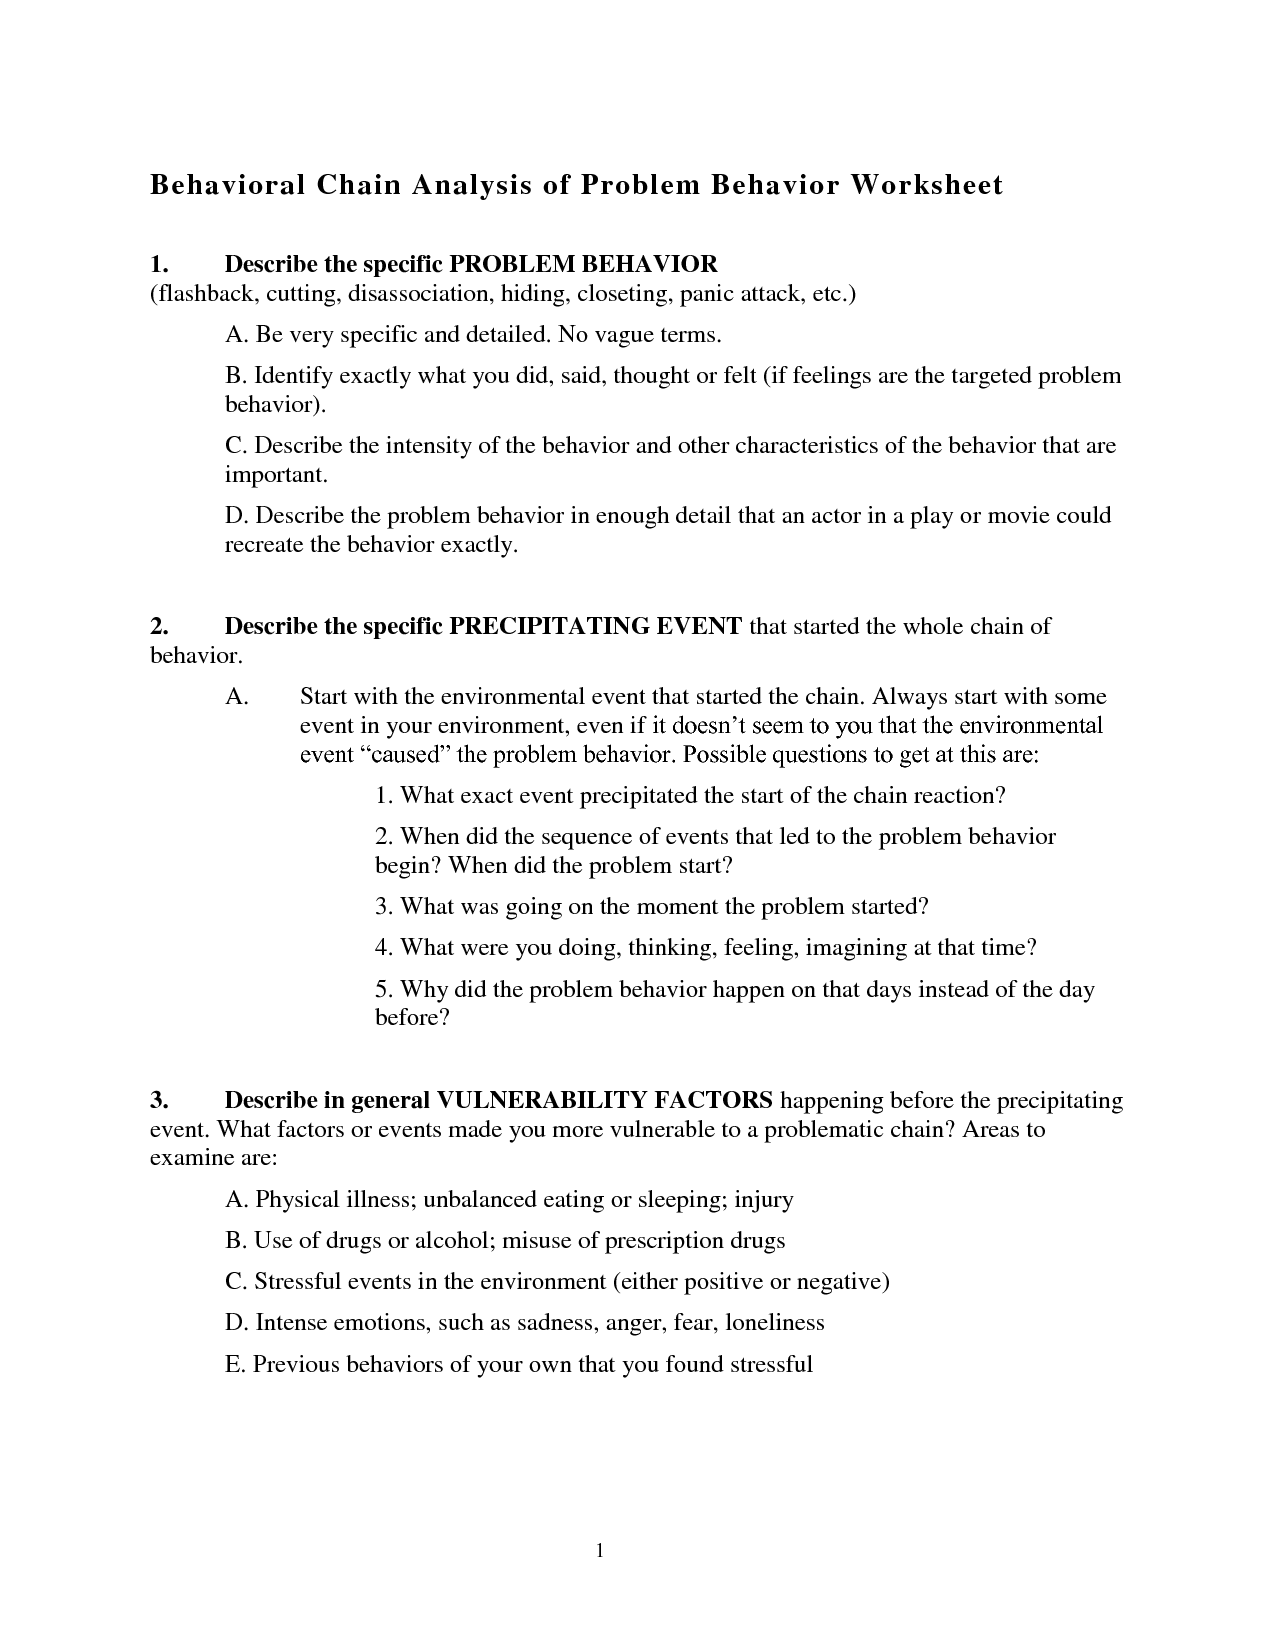 5 Awesome Behavioral Chainysis Worksheet Templates